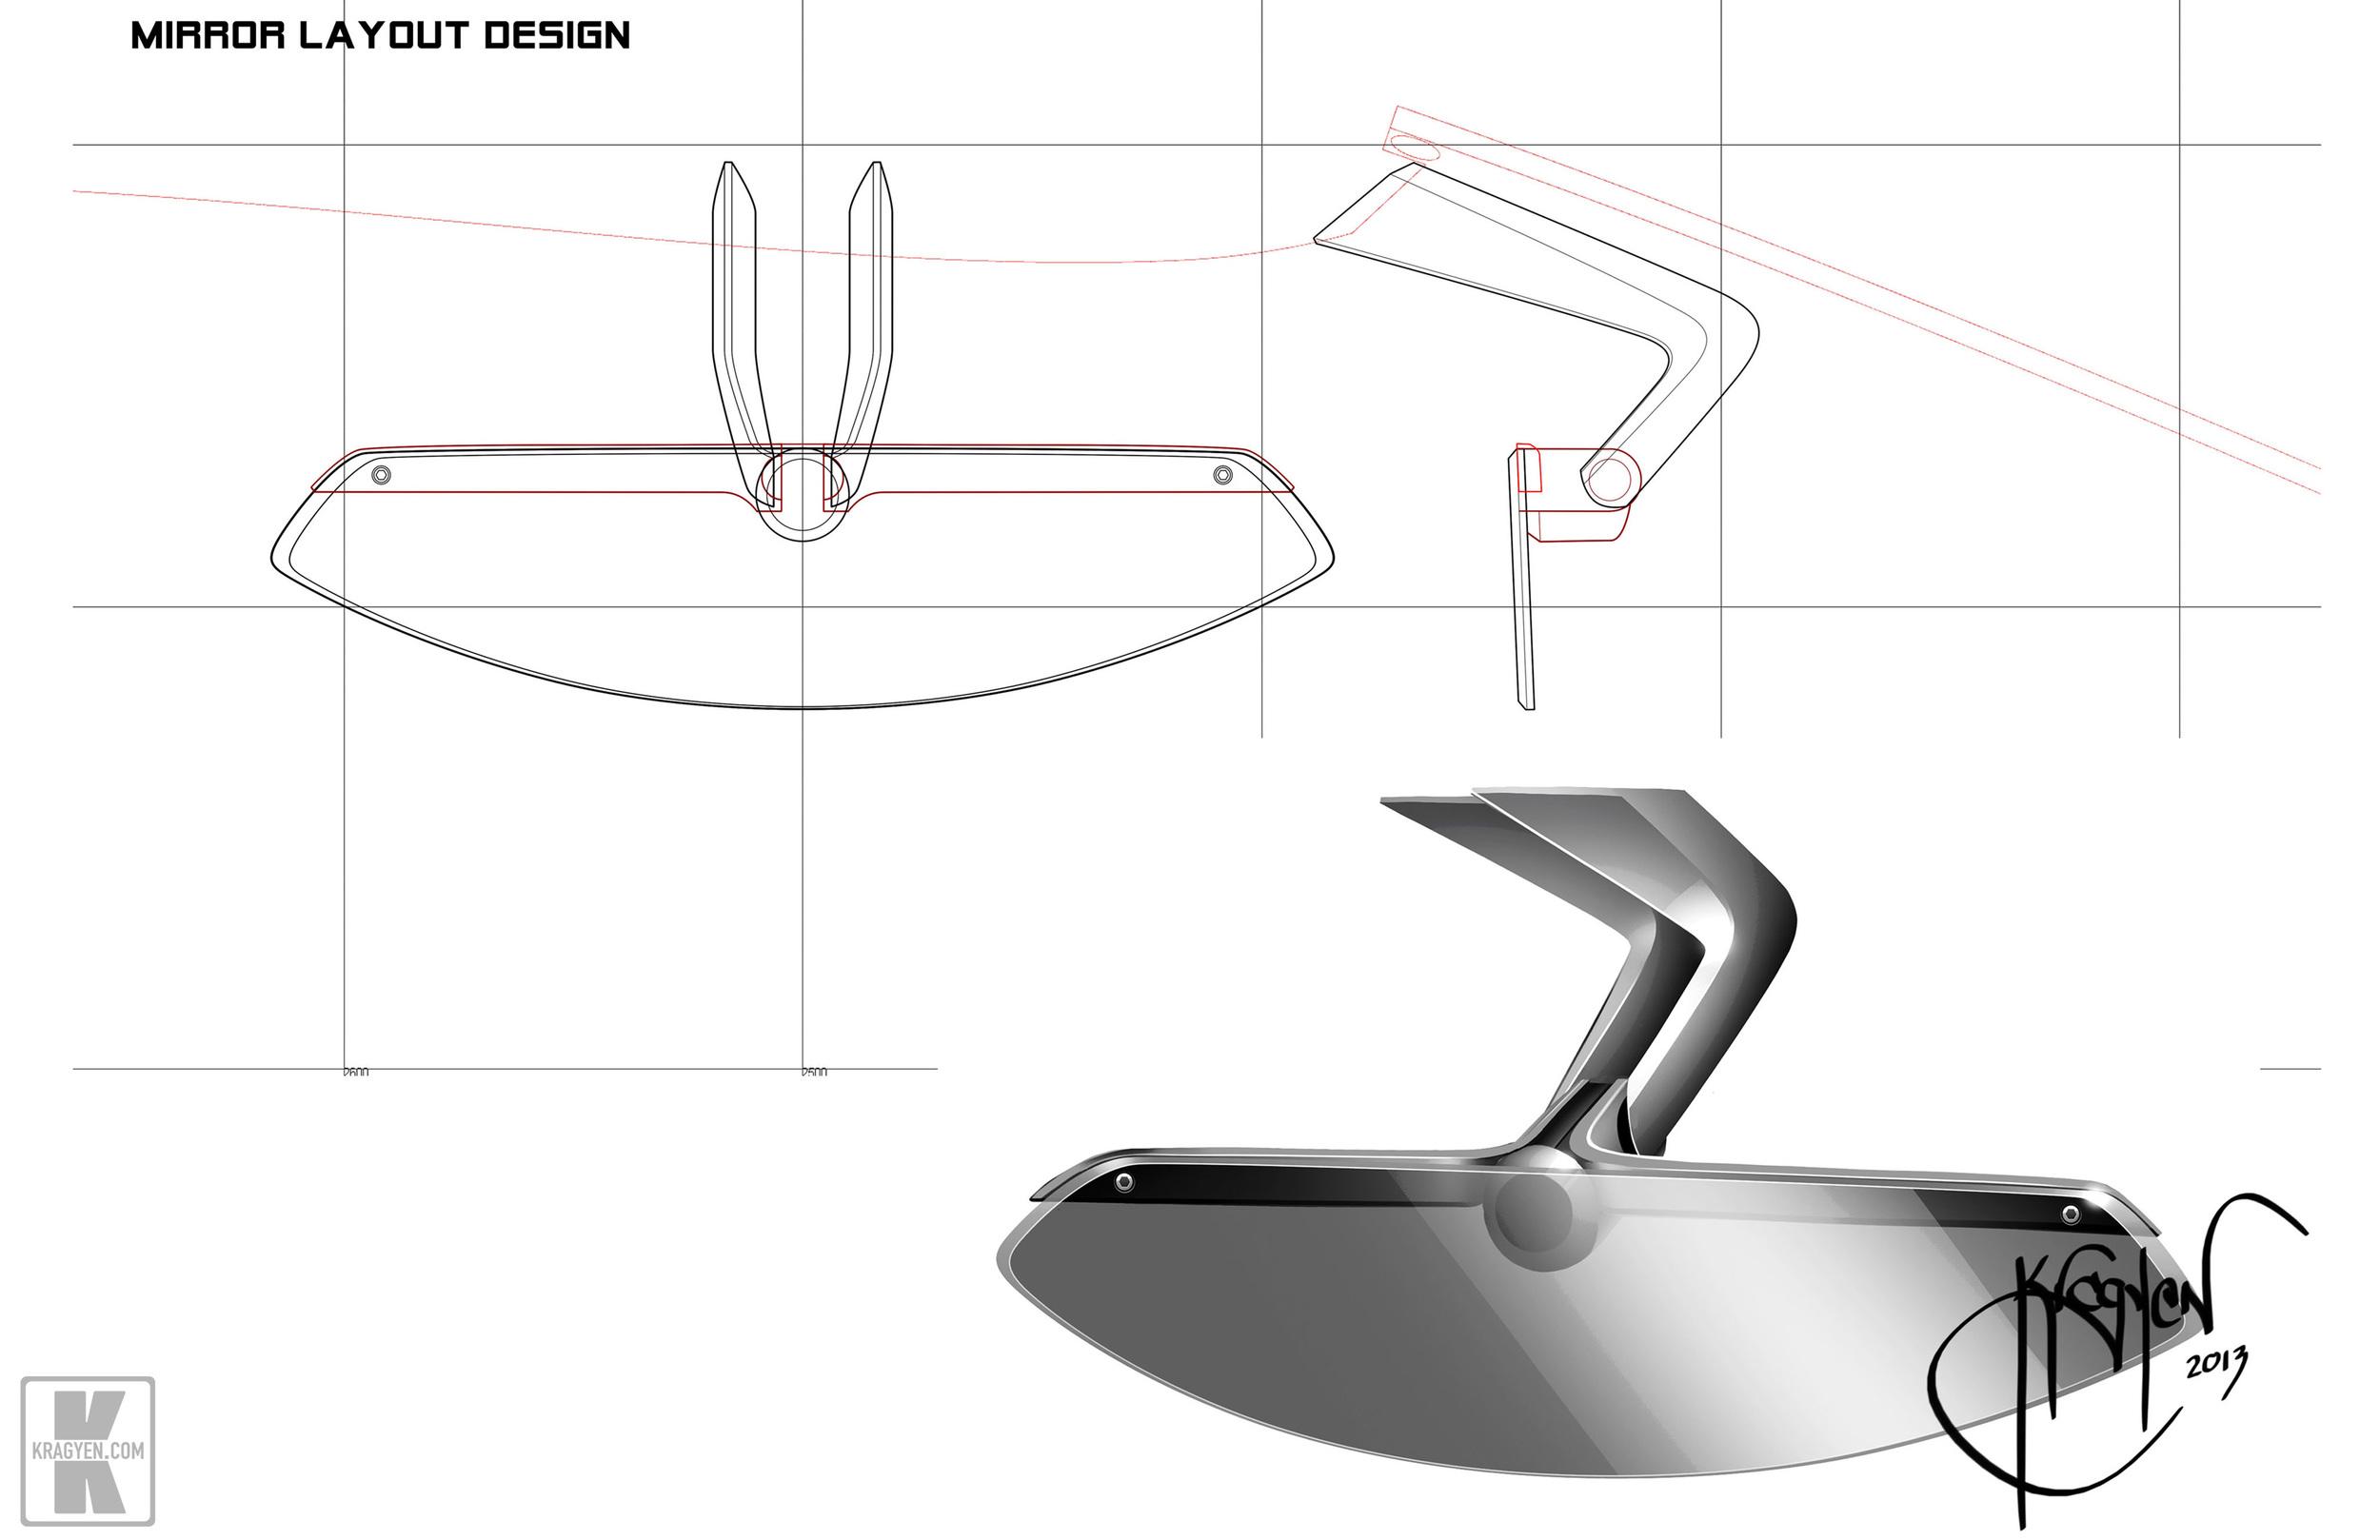 FT1_Interior_Parts3.jpg